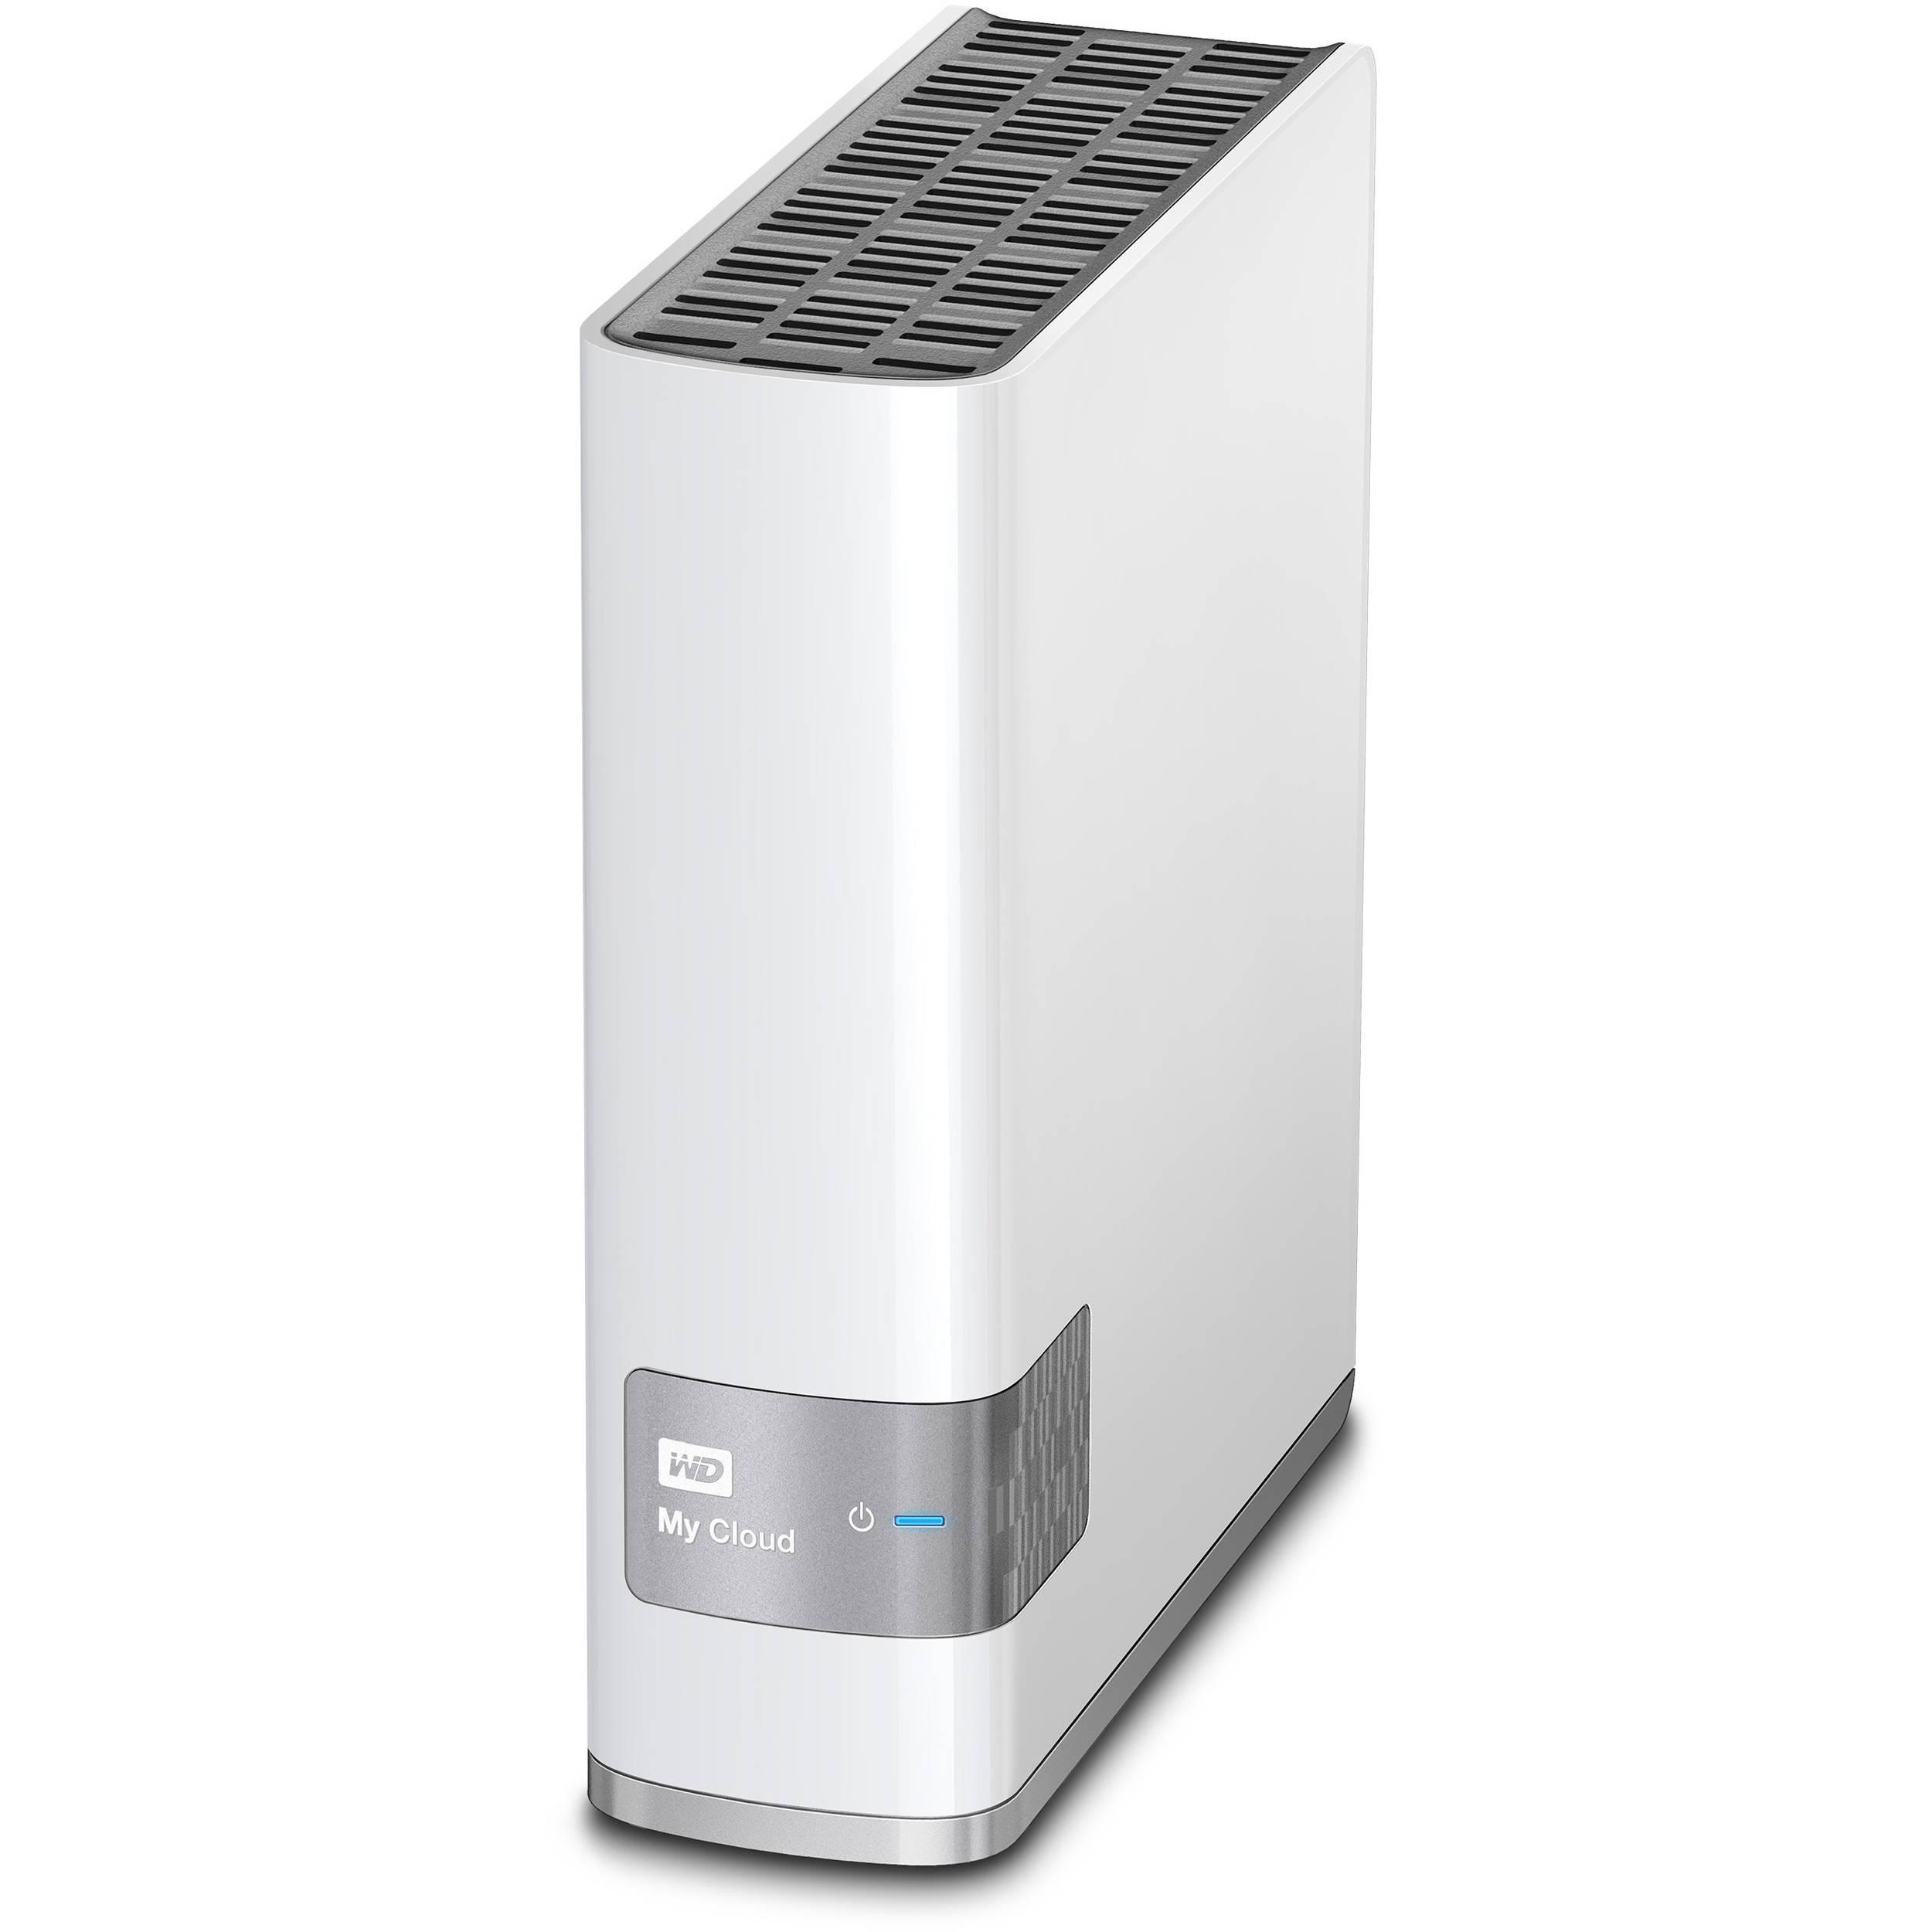 WD 8TB My Cloud Personal Cloud NAS Storage